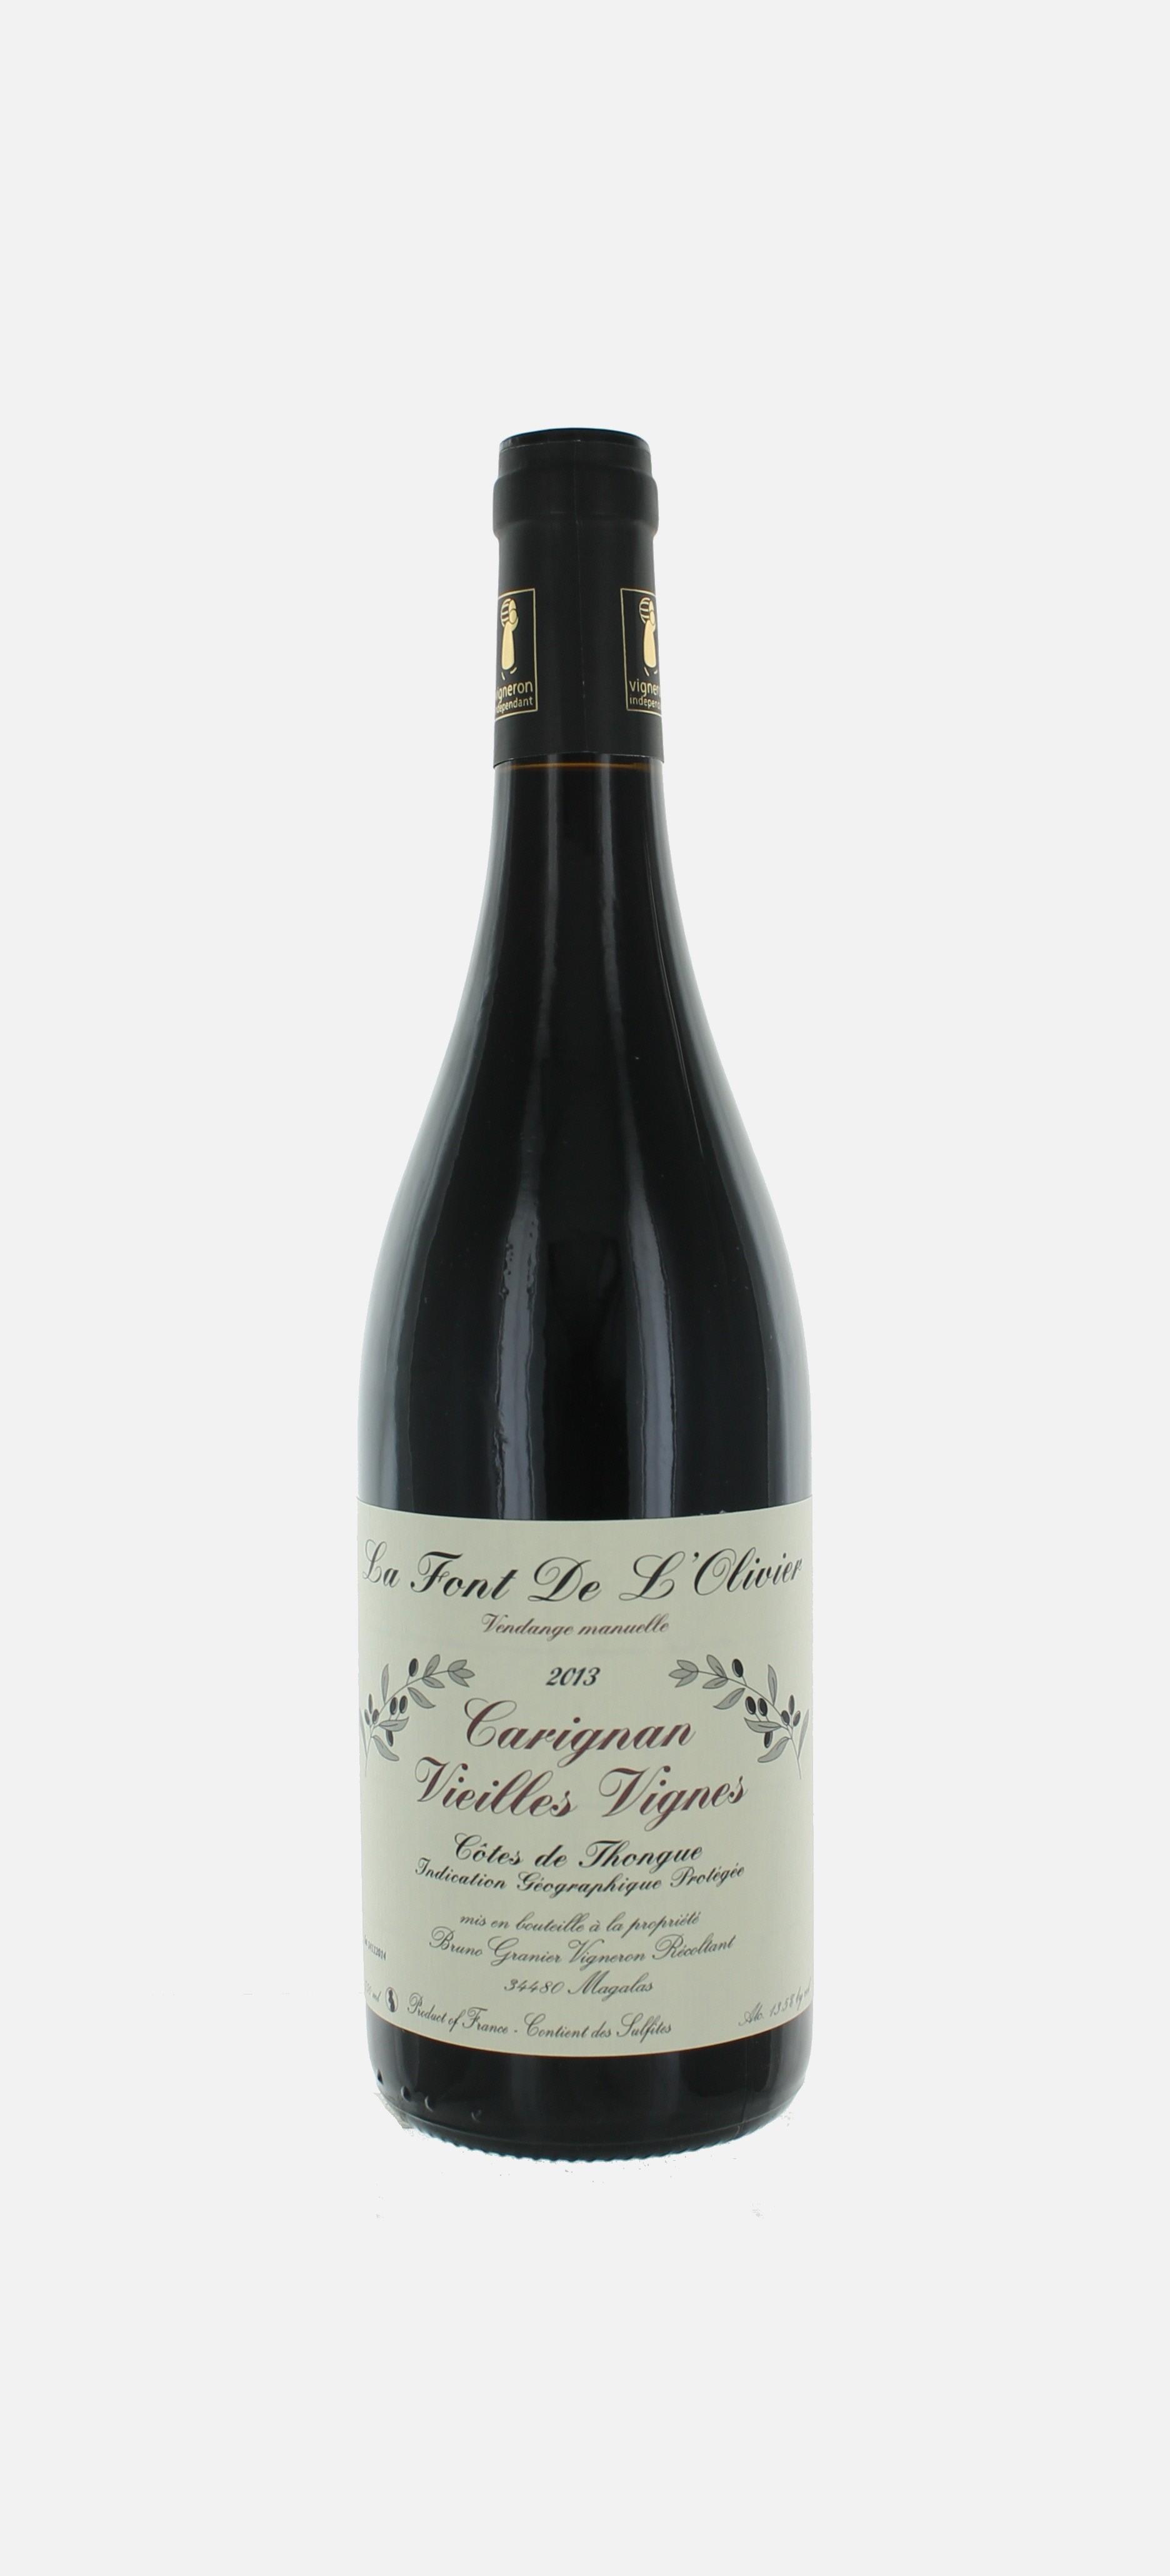 Carignan, Vieilles Vignes ,la Font de l'Olivier